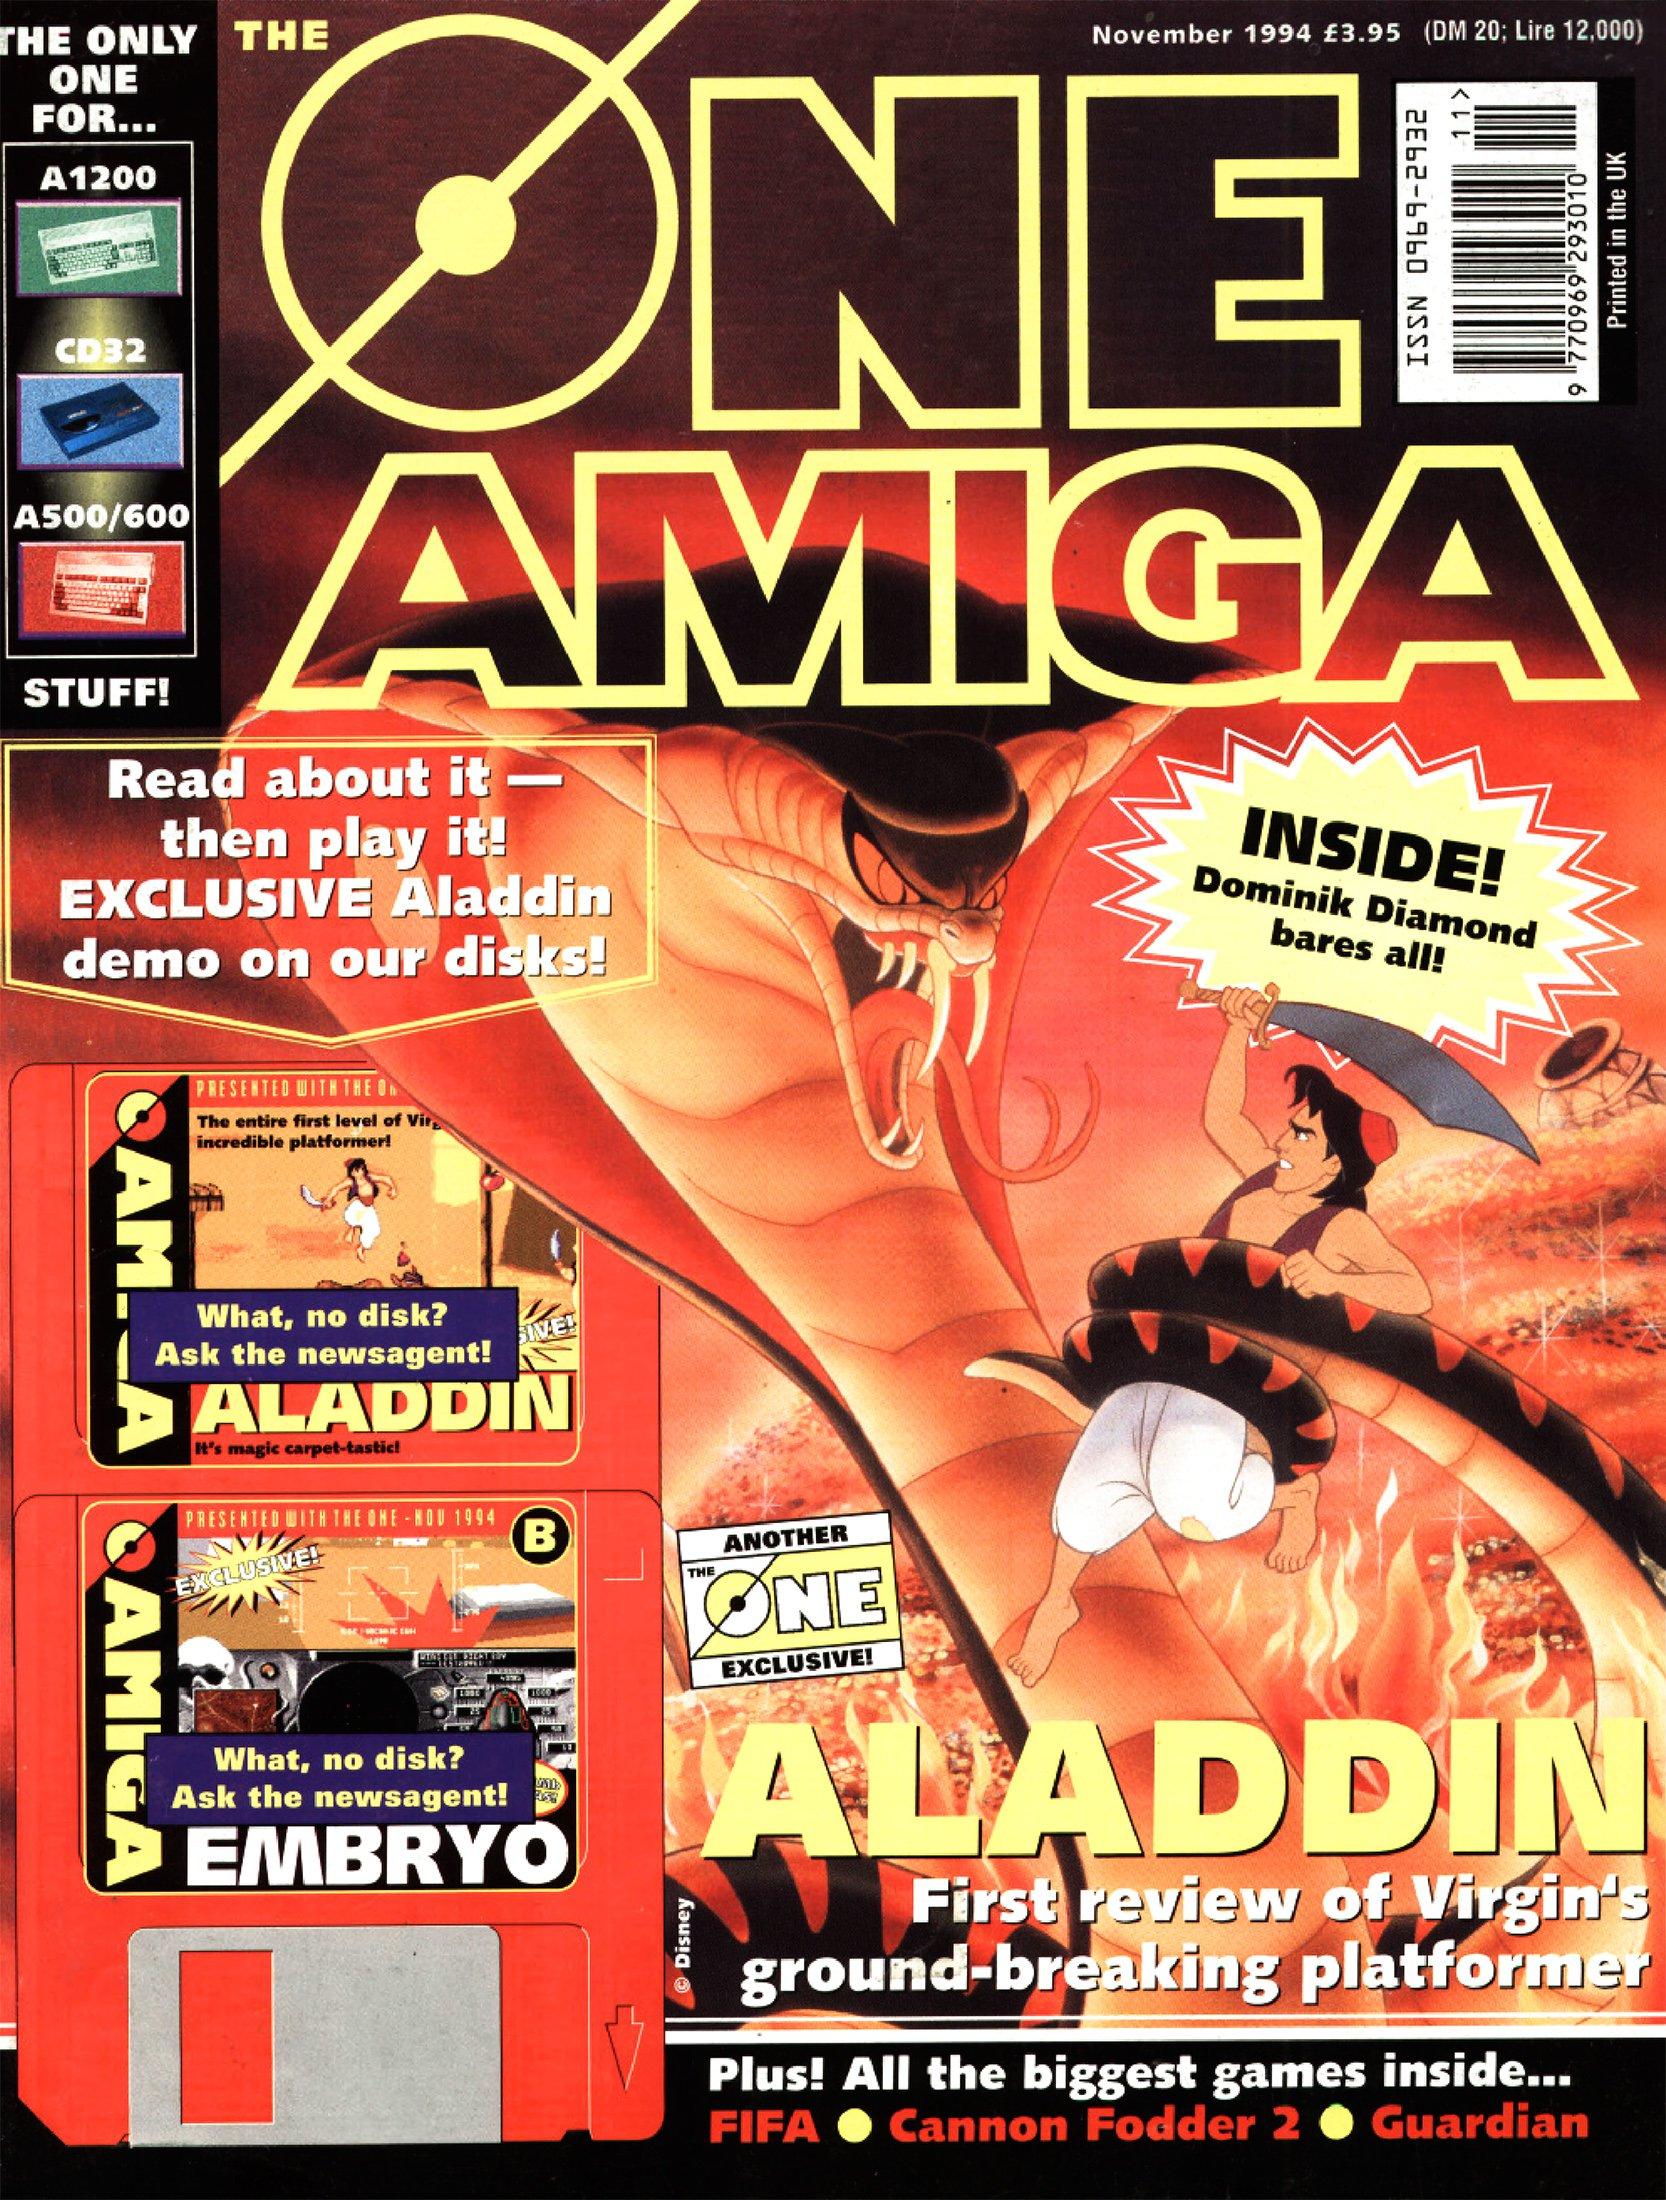 The One 074 (November 1994)